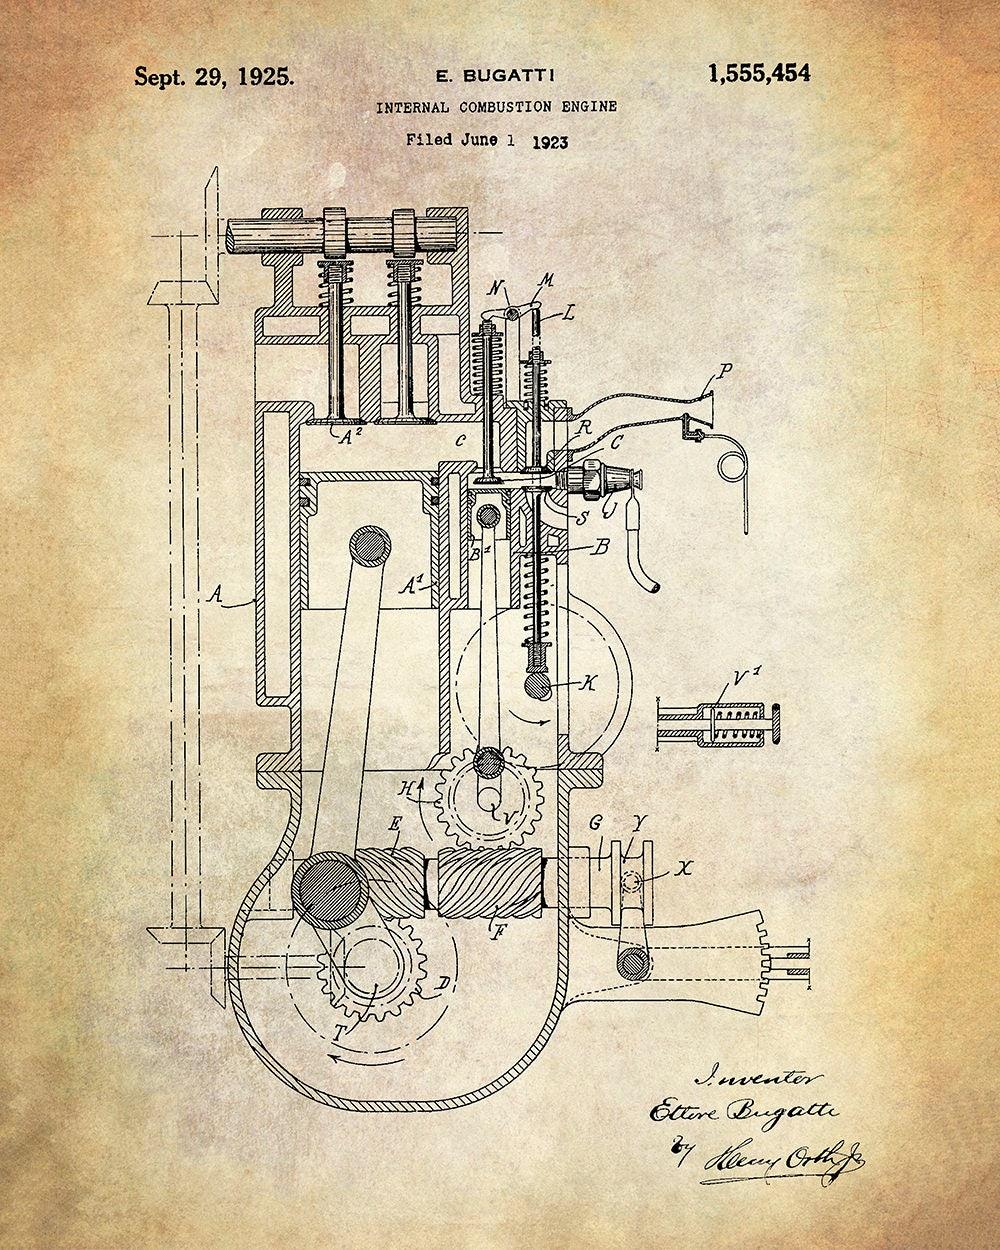 bugatti engine patent art print ettore bugatti internal combustionbugatti engine patent art print ettore bugatti internal combustion engine patent art print automotive engine patent print